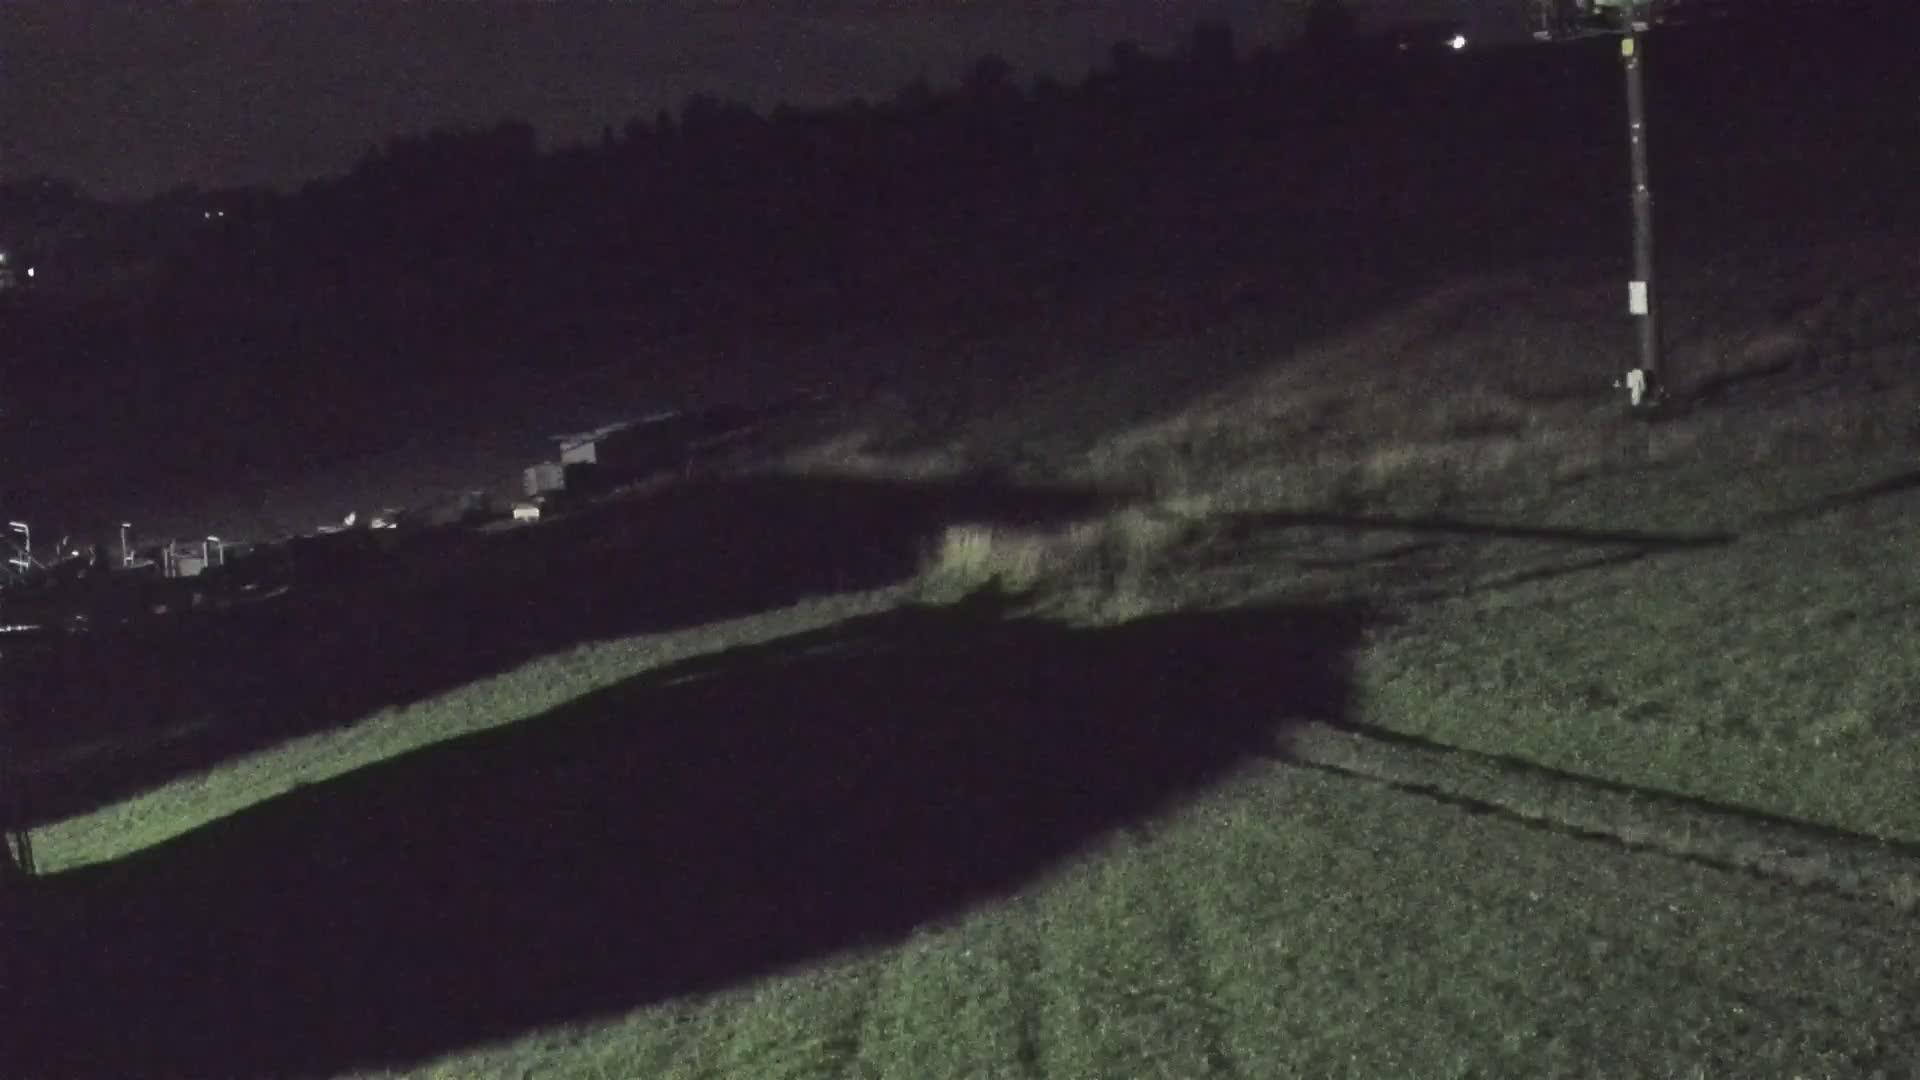 Stacja narciarska Koziniec-Ski